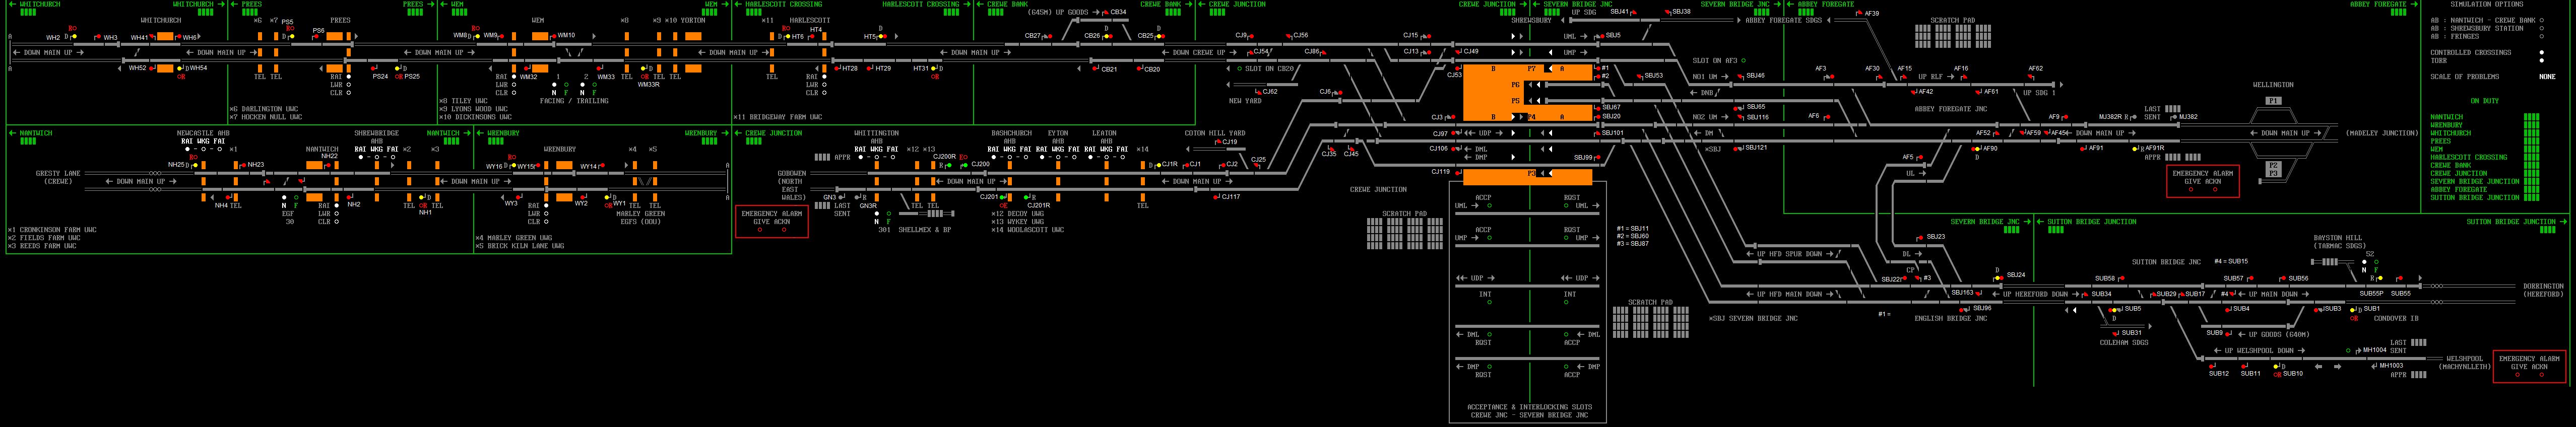 shrewsbury | SimSig - Simulator of Railway Signalling Systems